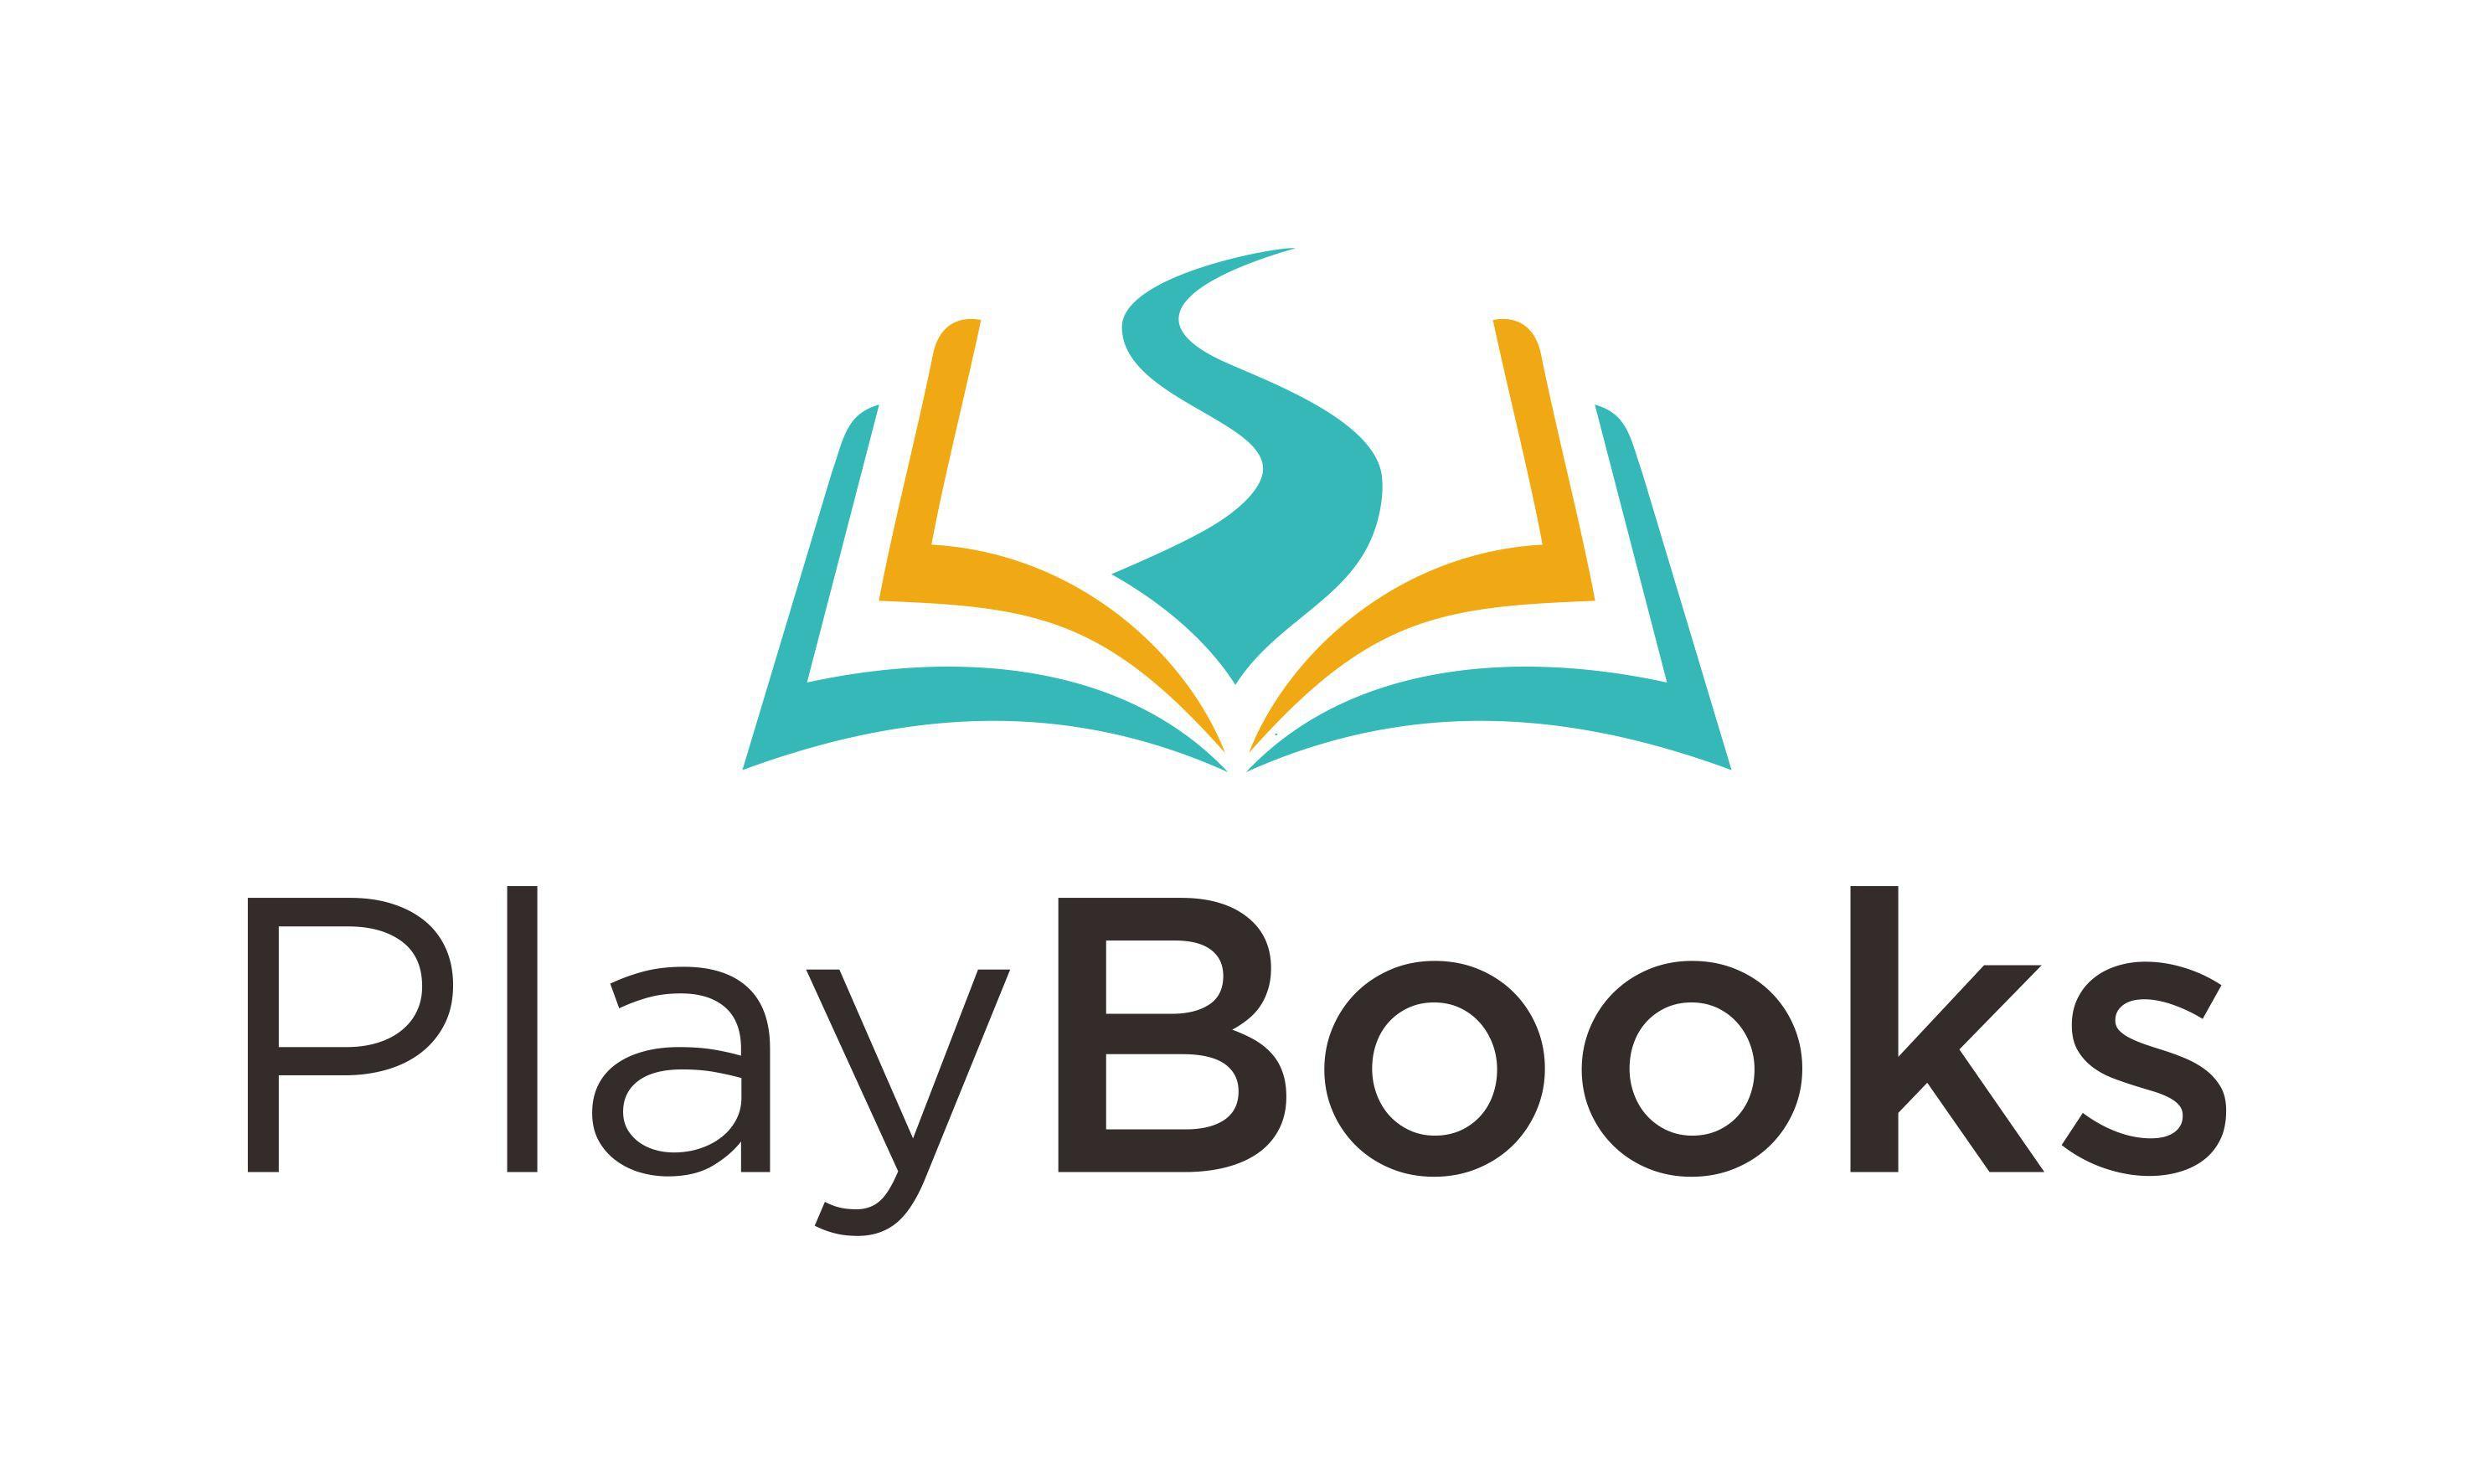 Logo to represent career advancement